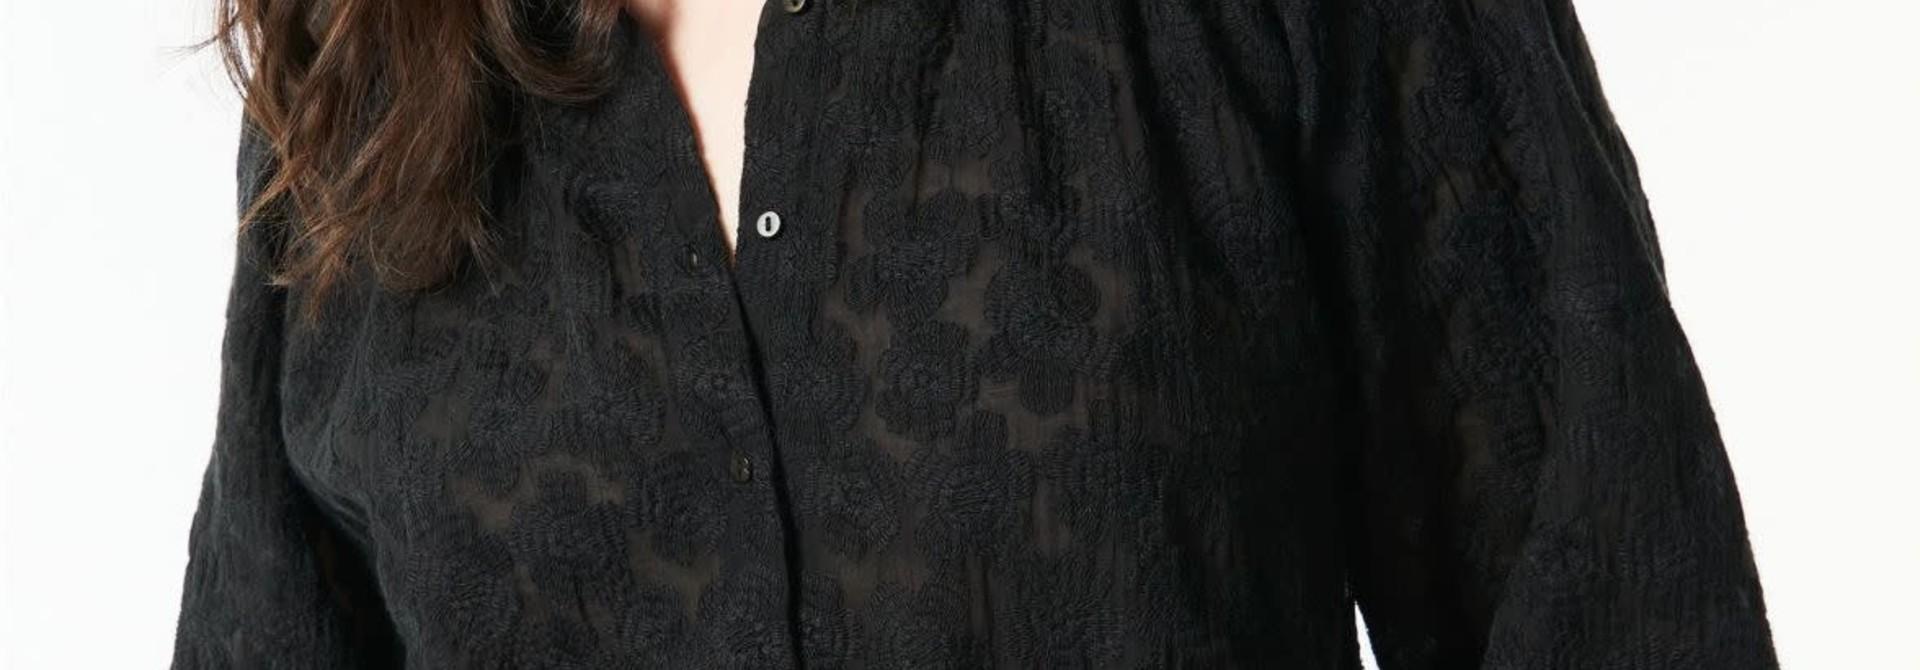 till  black blouse